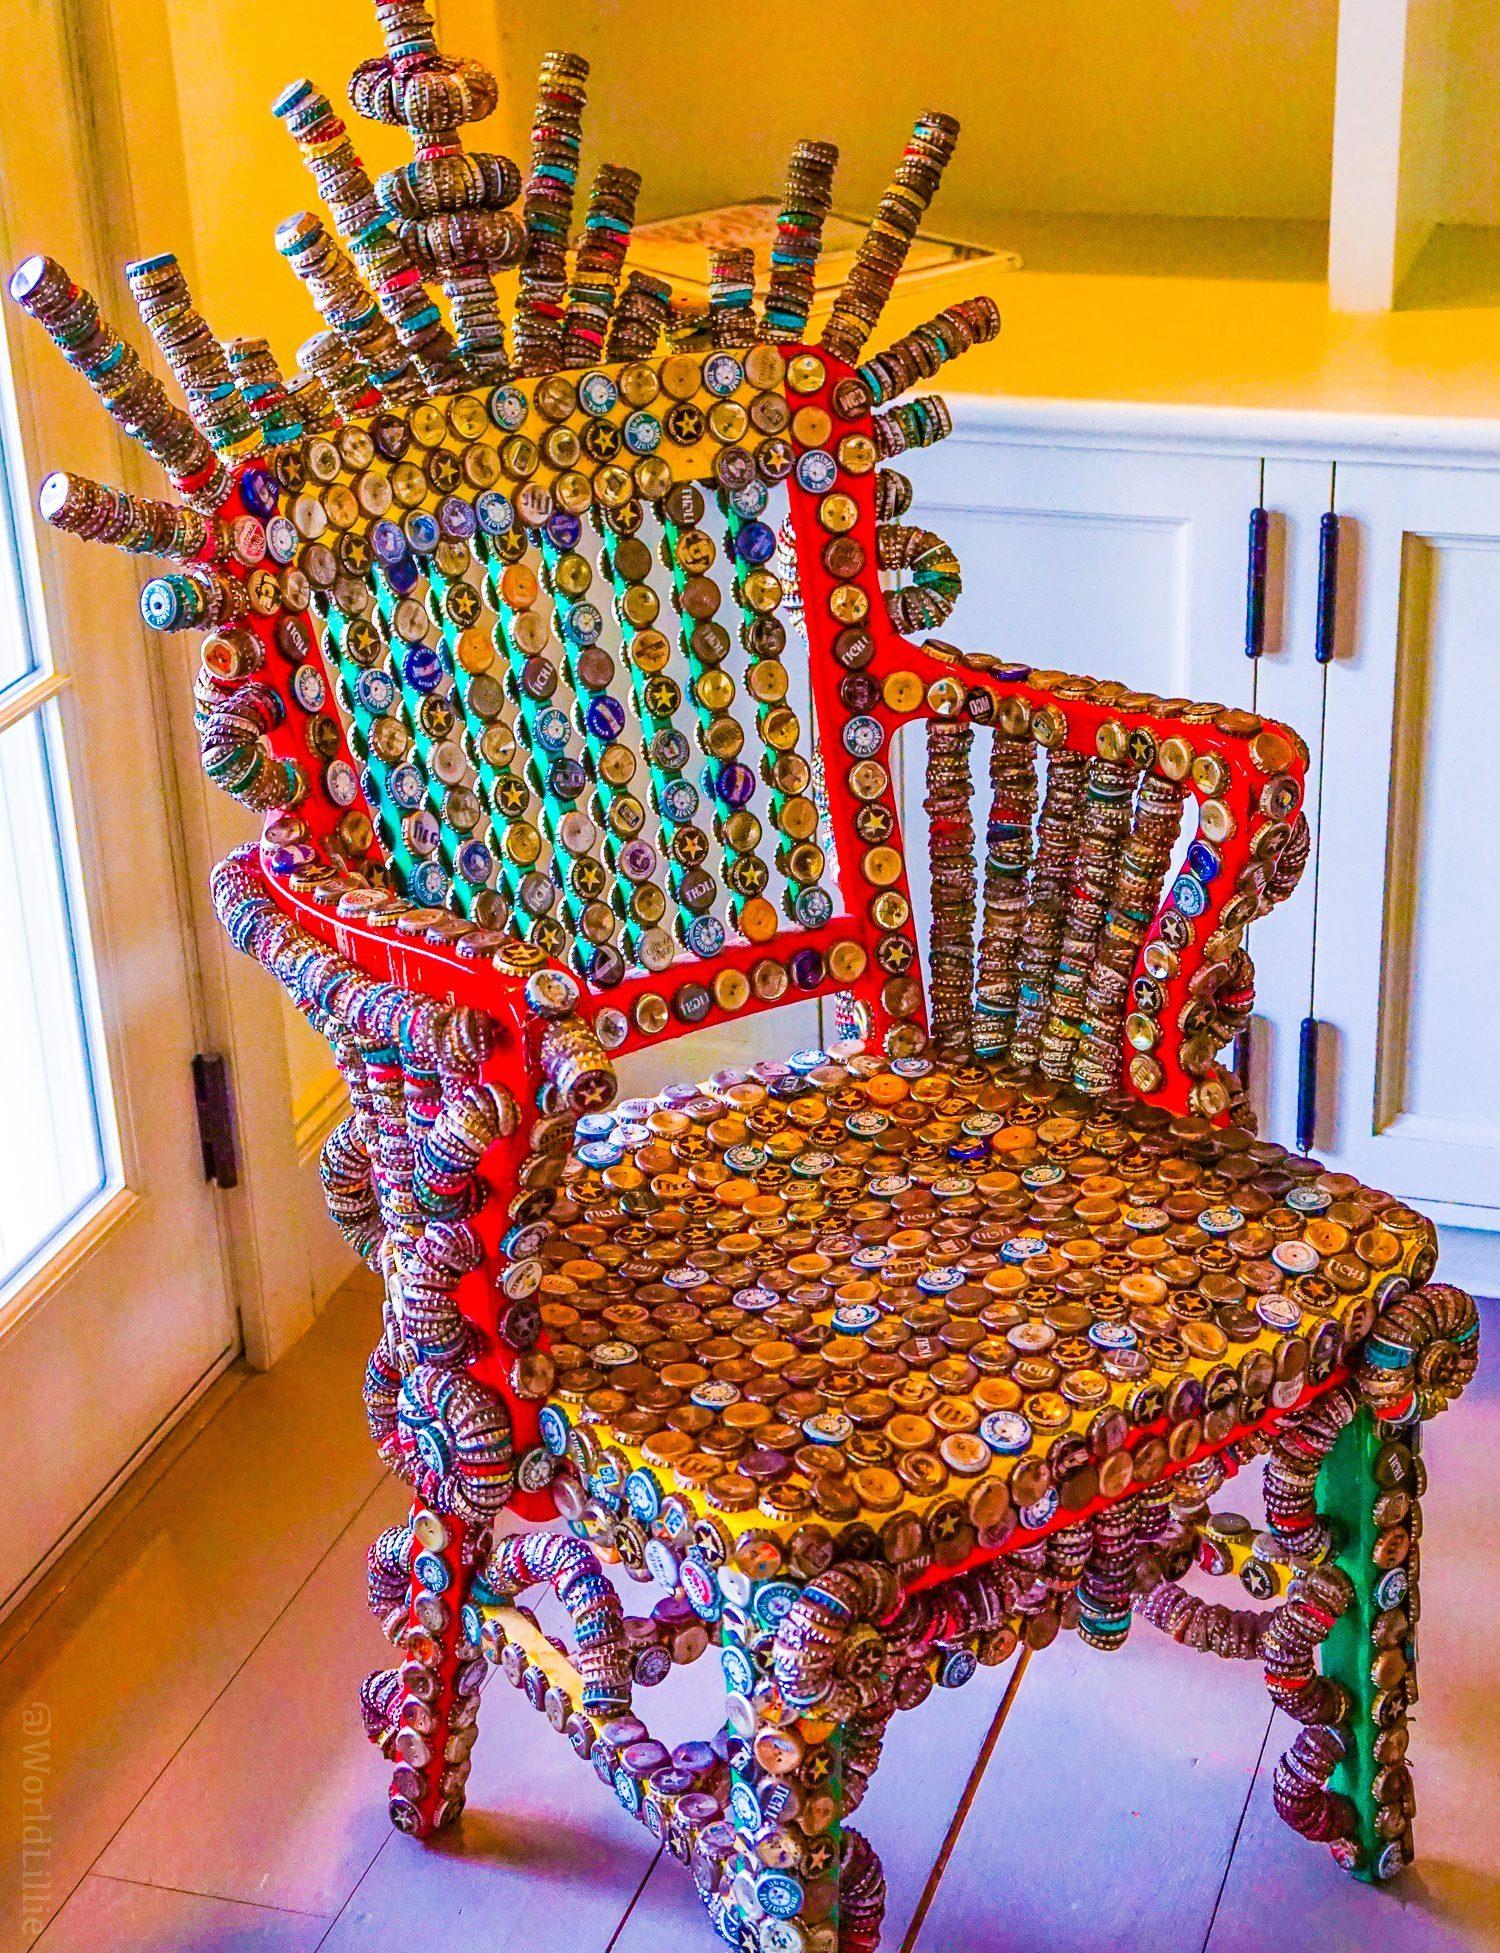 Bottle cap art: Modern art chair from recycled materials at the Red Lion Inn.